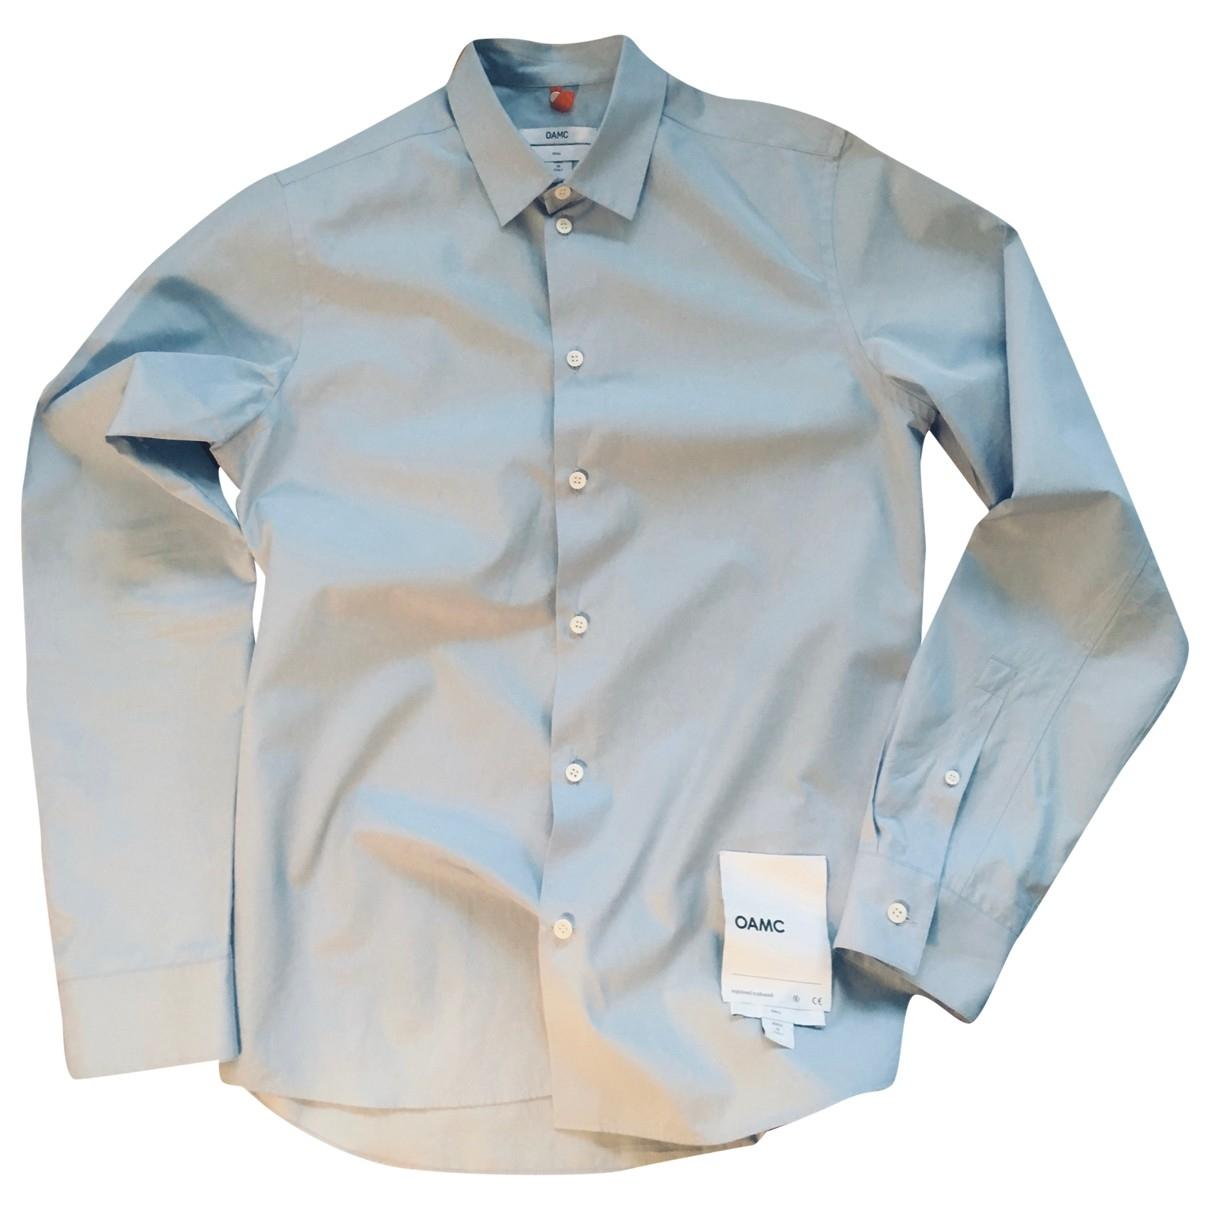 Oamc \N Blue Cotton Shirts for Men S International